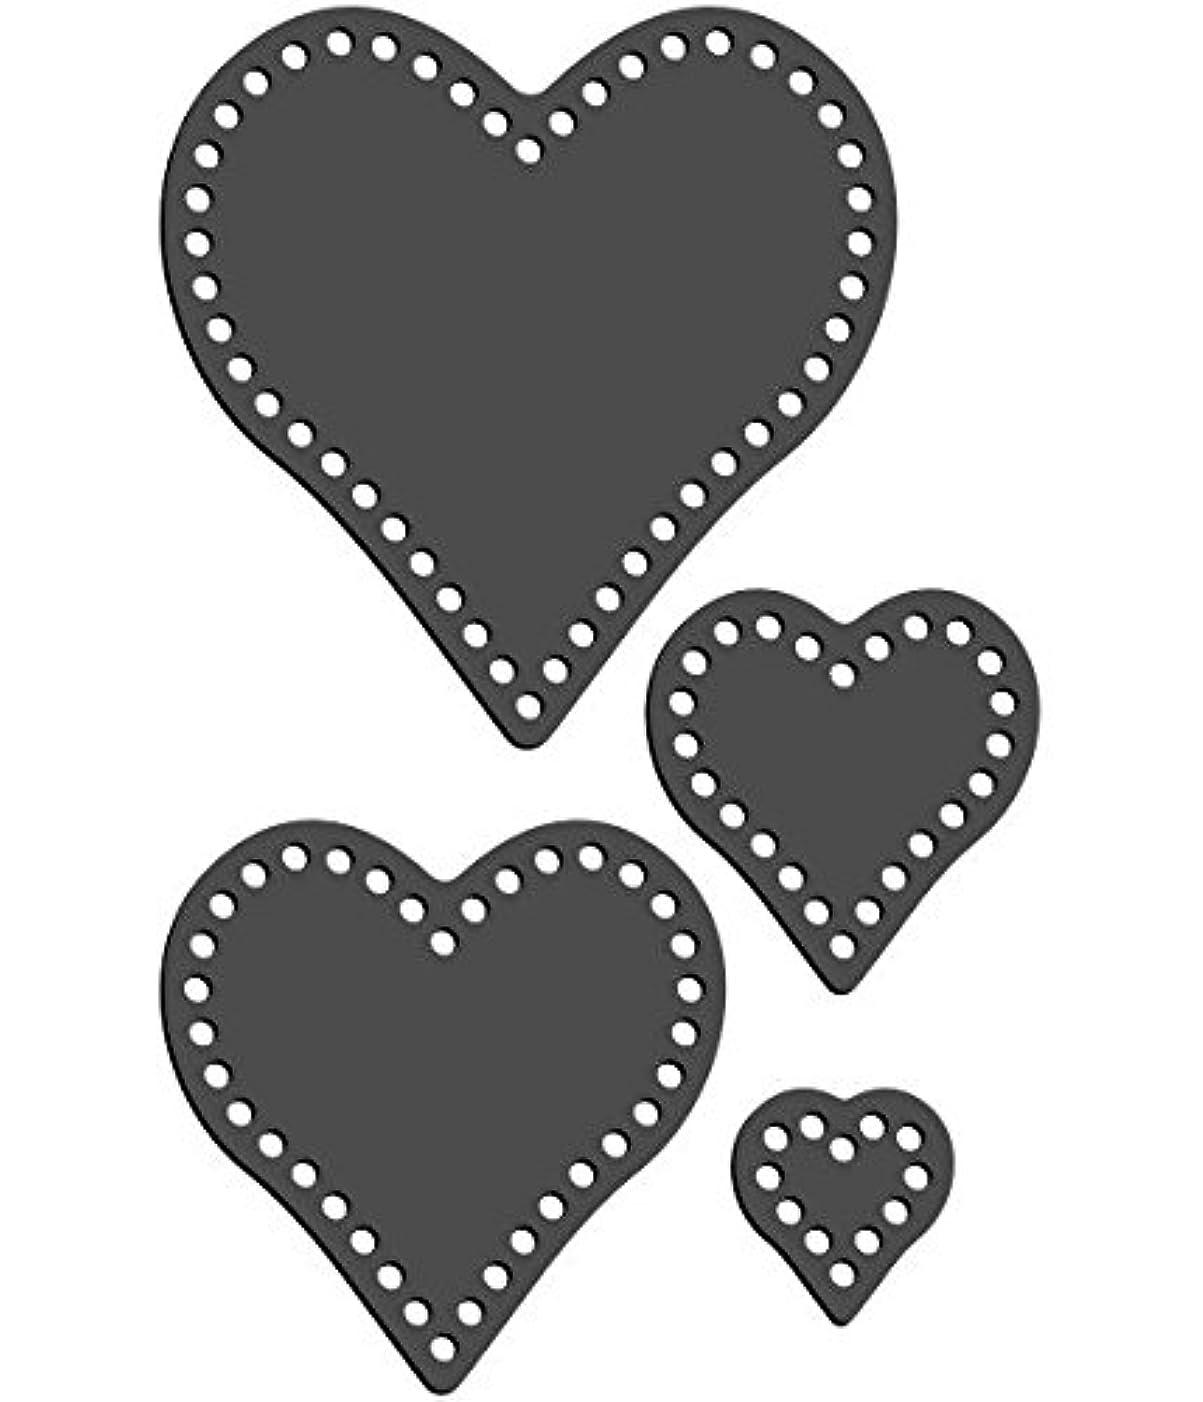 Rhinestone Genie Hearts 010 Magnetic Rhinestone Template